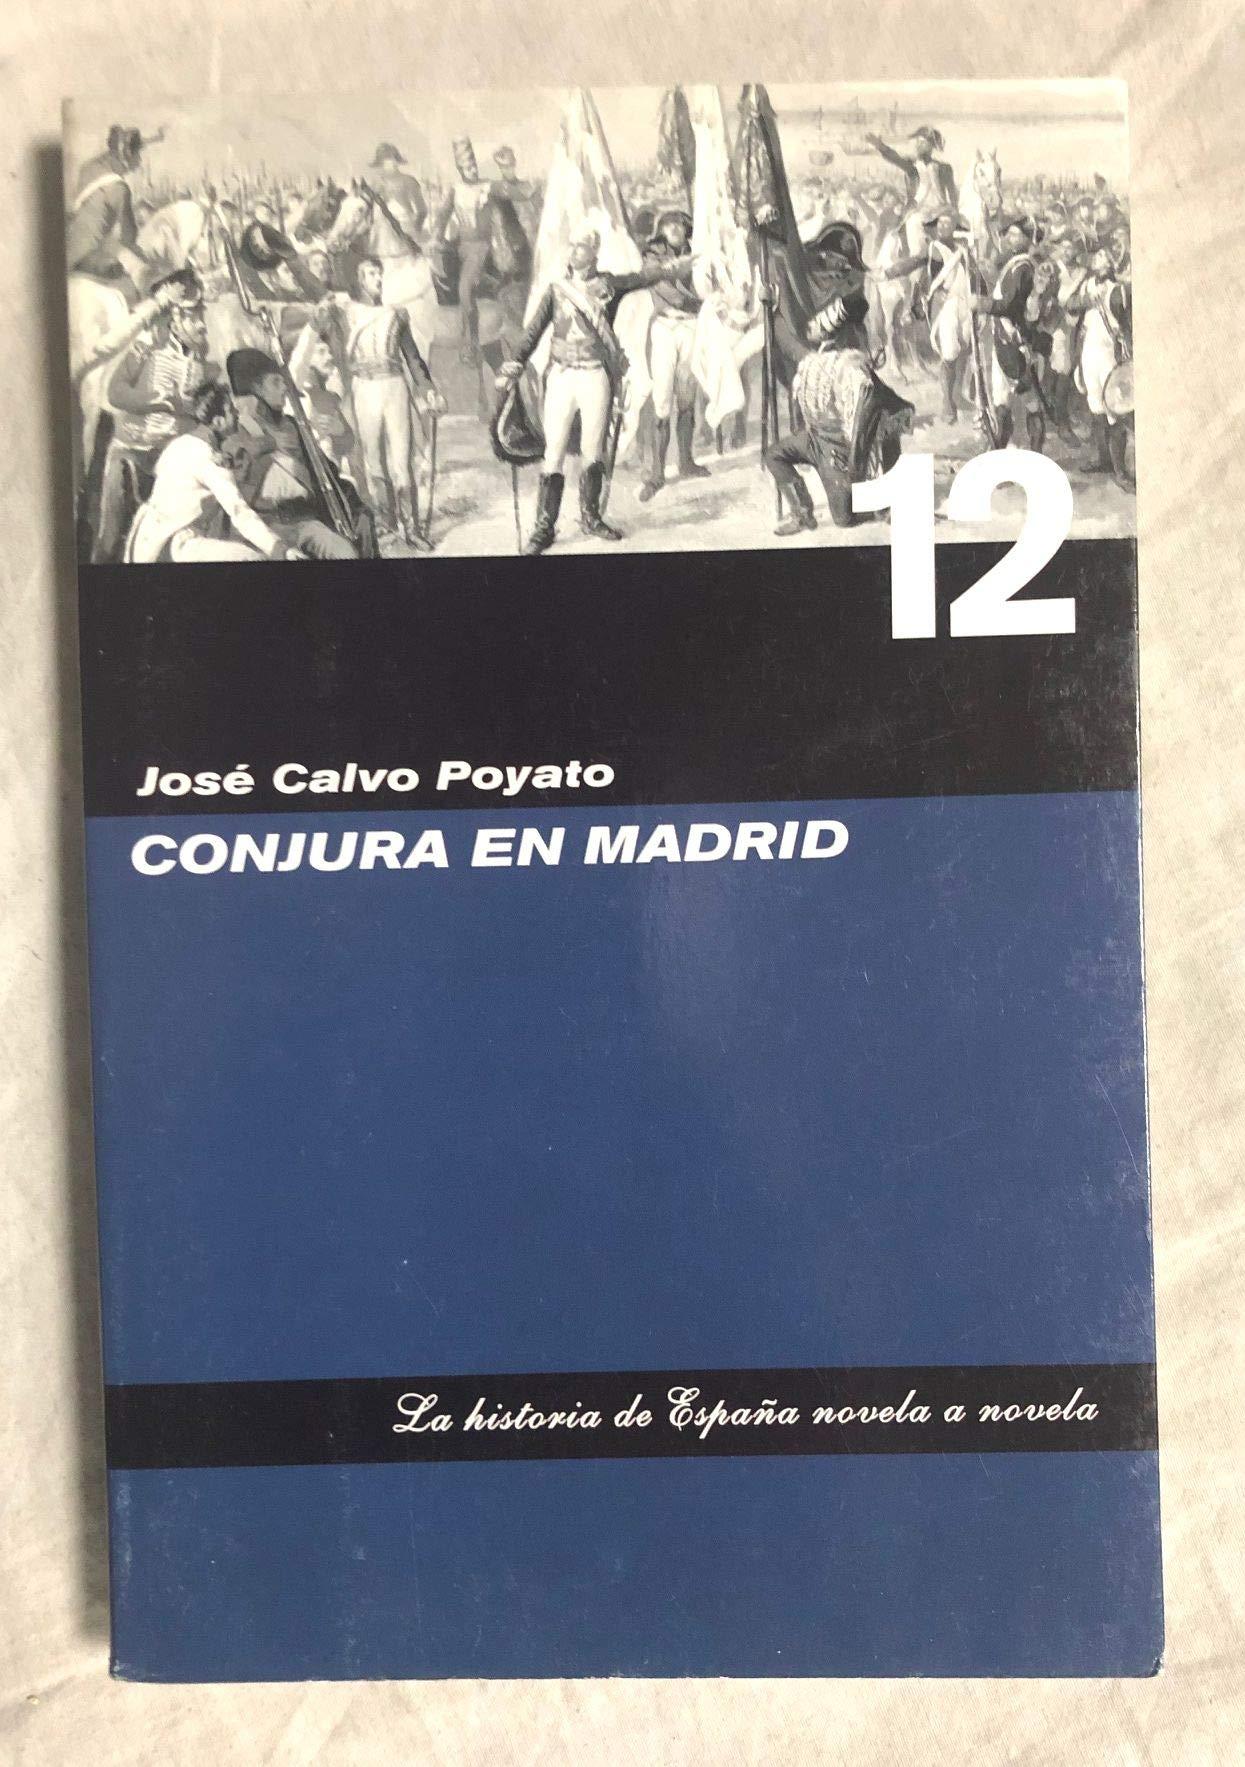 CONJURA EN MADRID. Col. La hostoria de España novela a novela nº12 ...